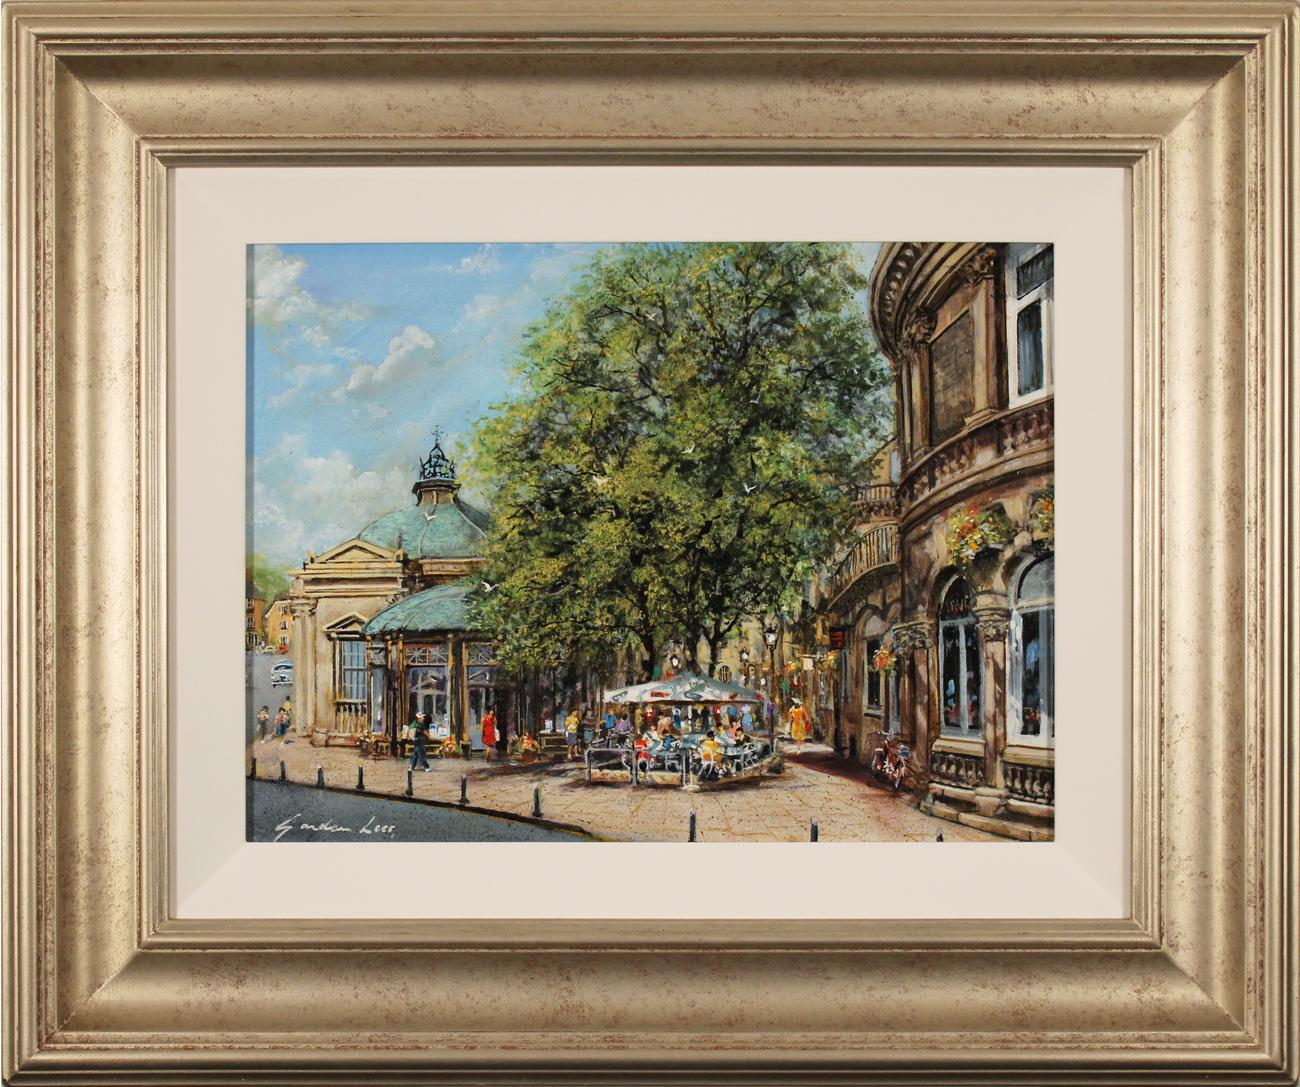 Gordon Lees, Original oil painting on panel, Café Days, Harrogate Click to enlarge